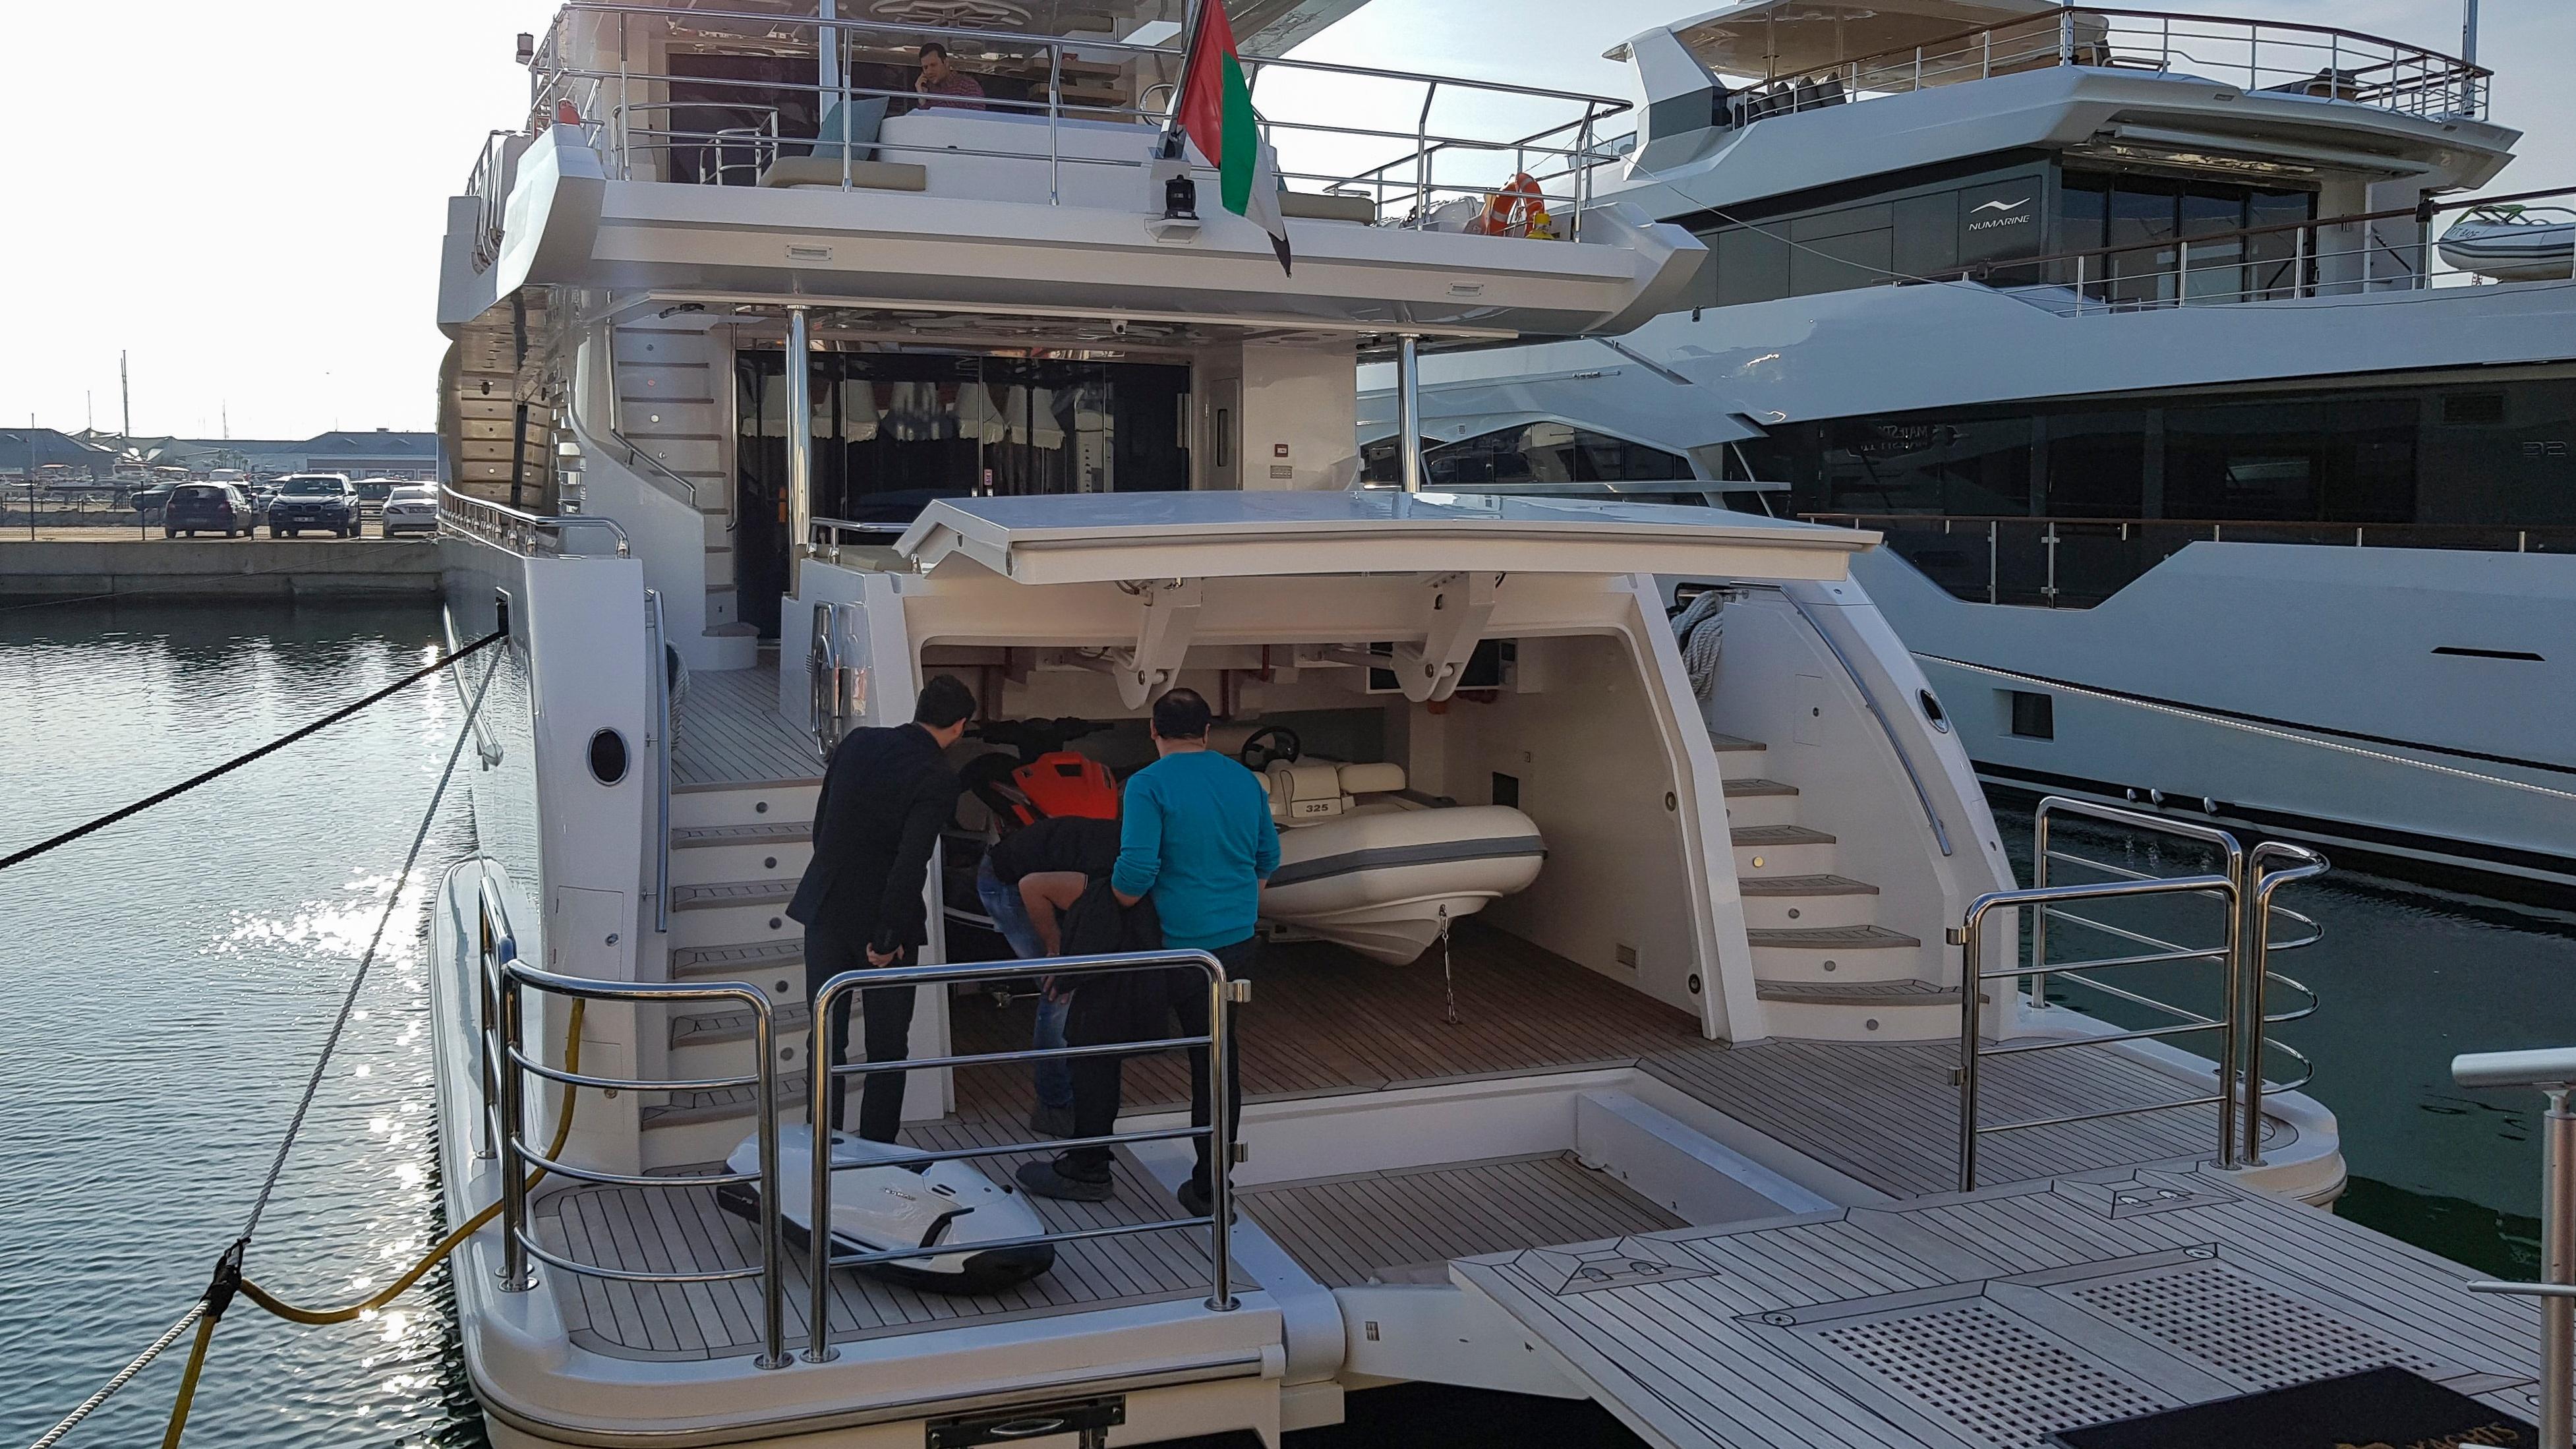 Gulf Craft at Tuzla Boat Show 2018 (5).jpg